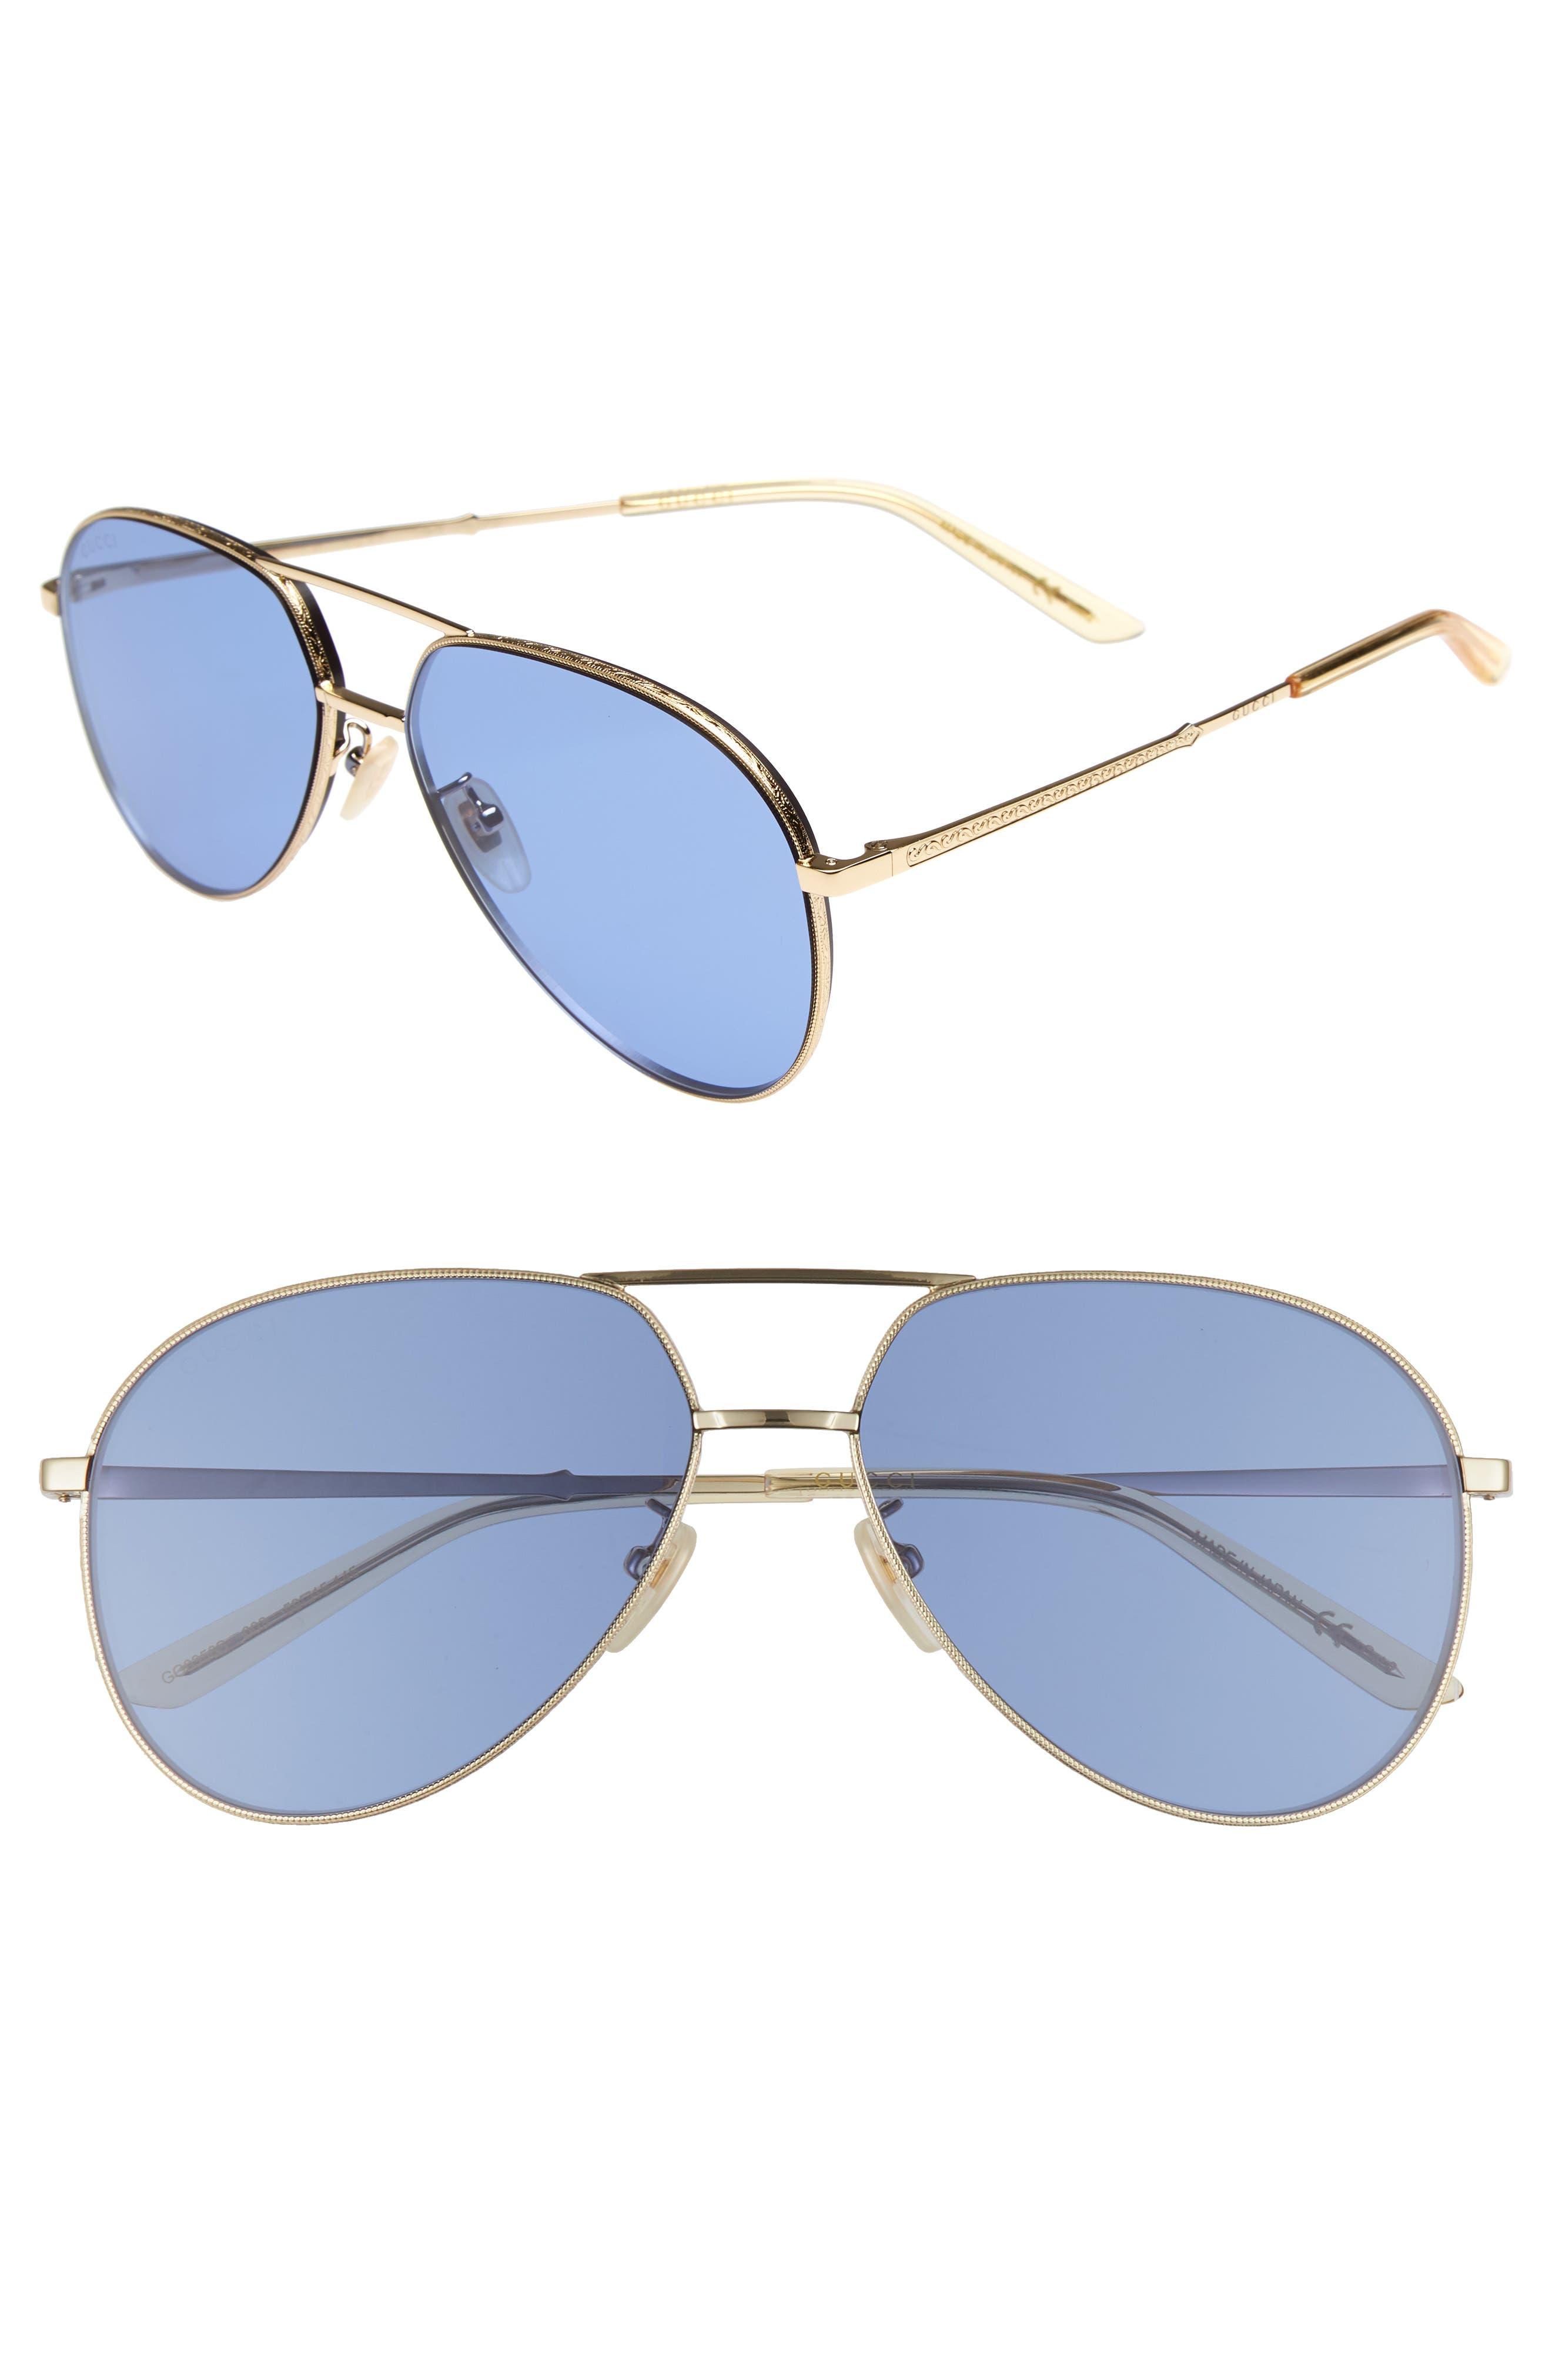 59mm Aviator Sunglasses,                         Main,                         color, GOLD/ YELLOW